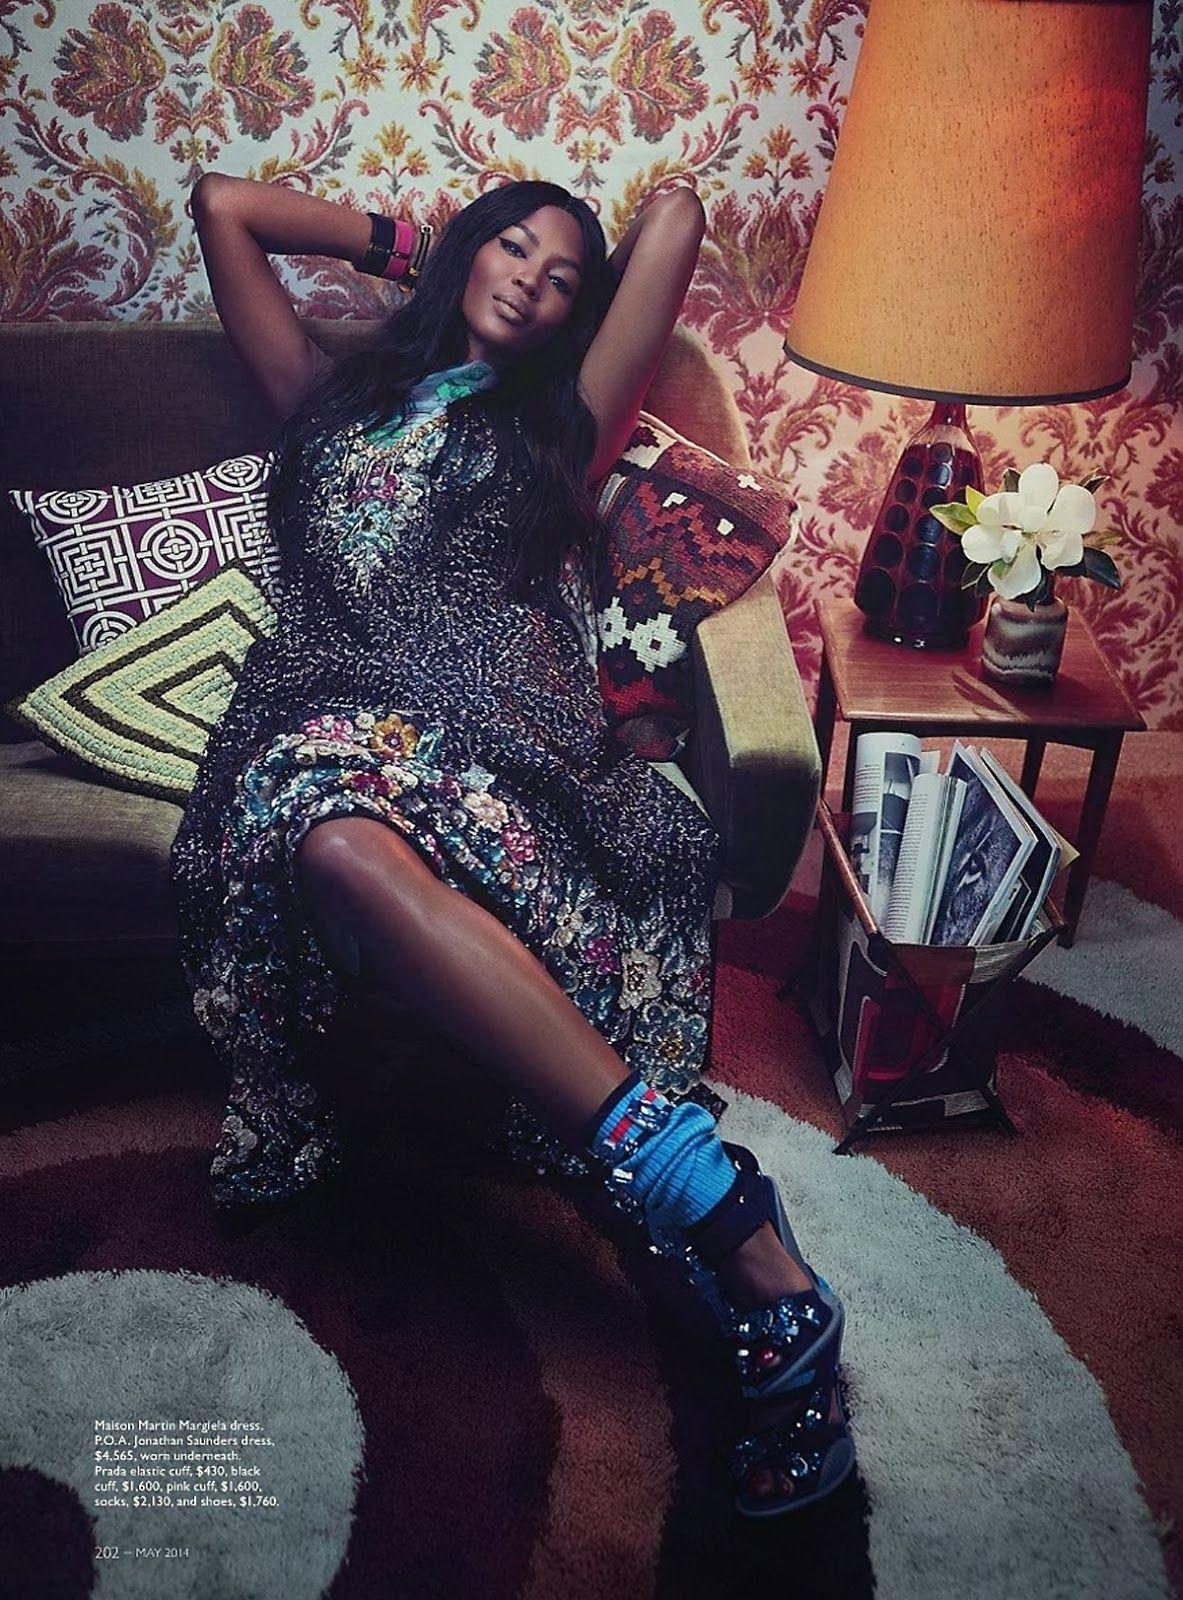 ☆ Naomi Campbell | Photography by Emma Summerton | For Vogue Magazine Australia | May 2014 ☆ #Naomi_Campbell #Emma_Summerton #Vogue #2014